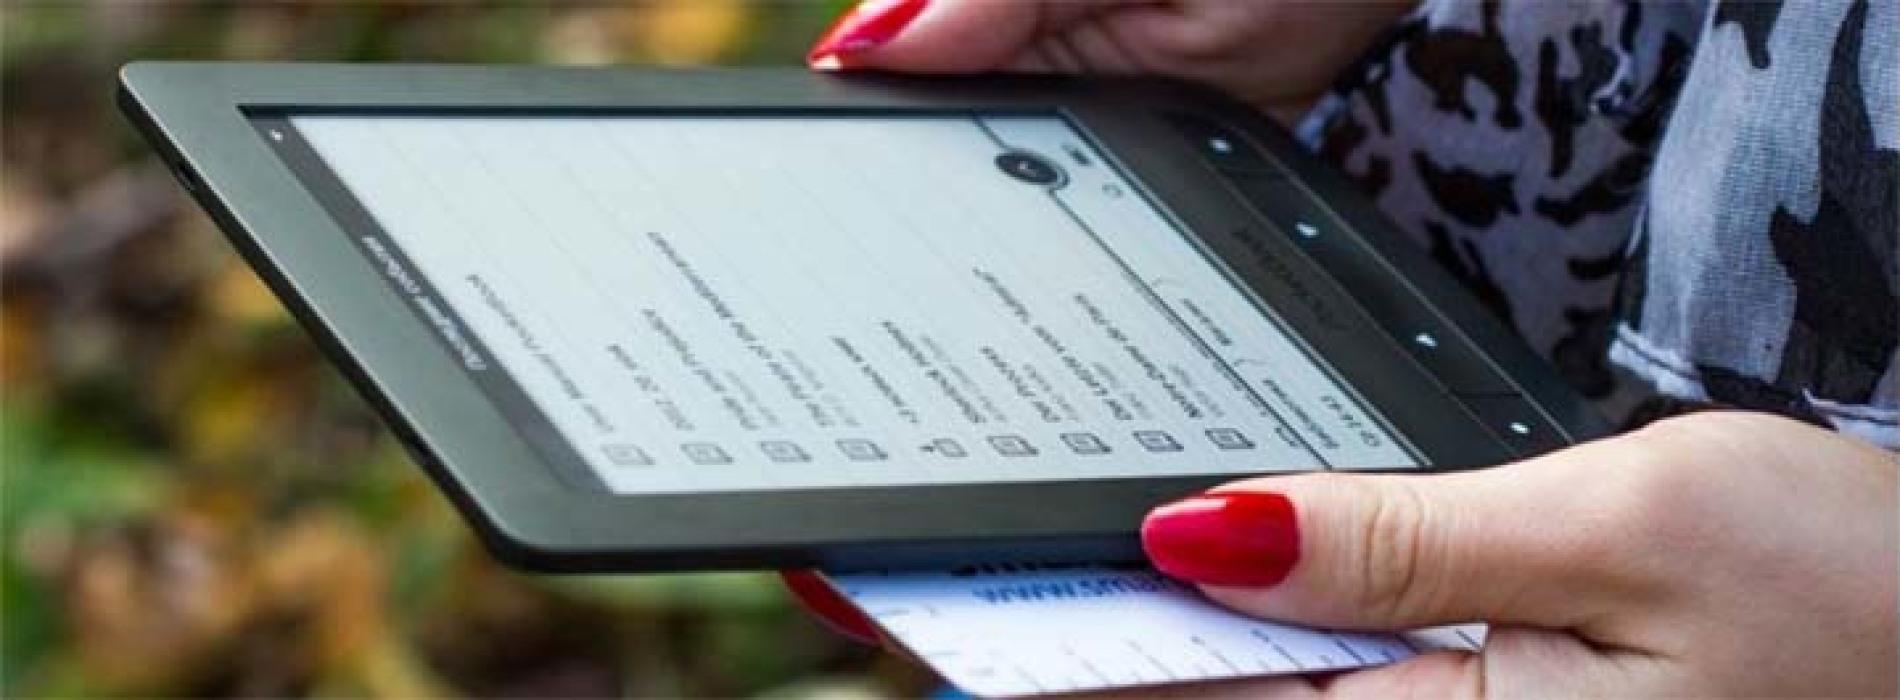 Замена экрана электронной книги